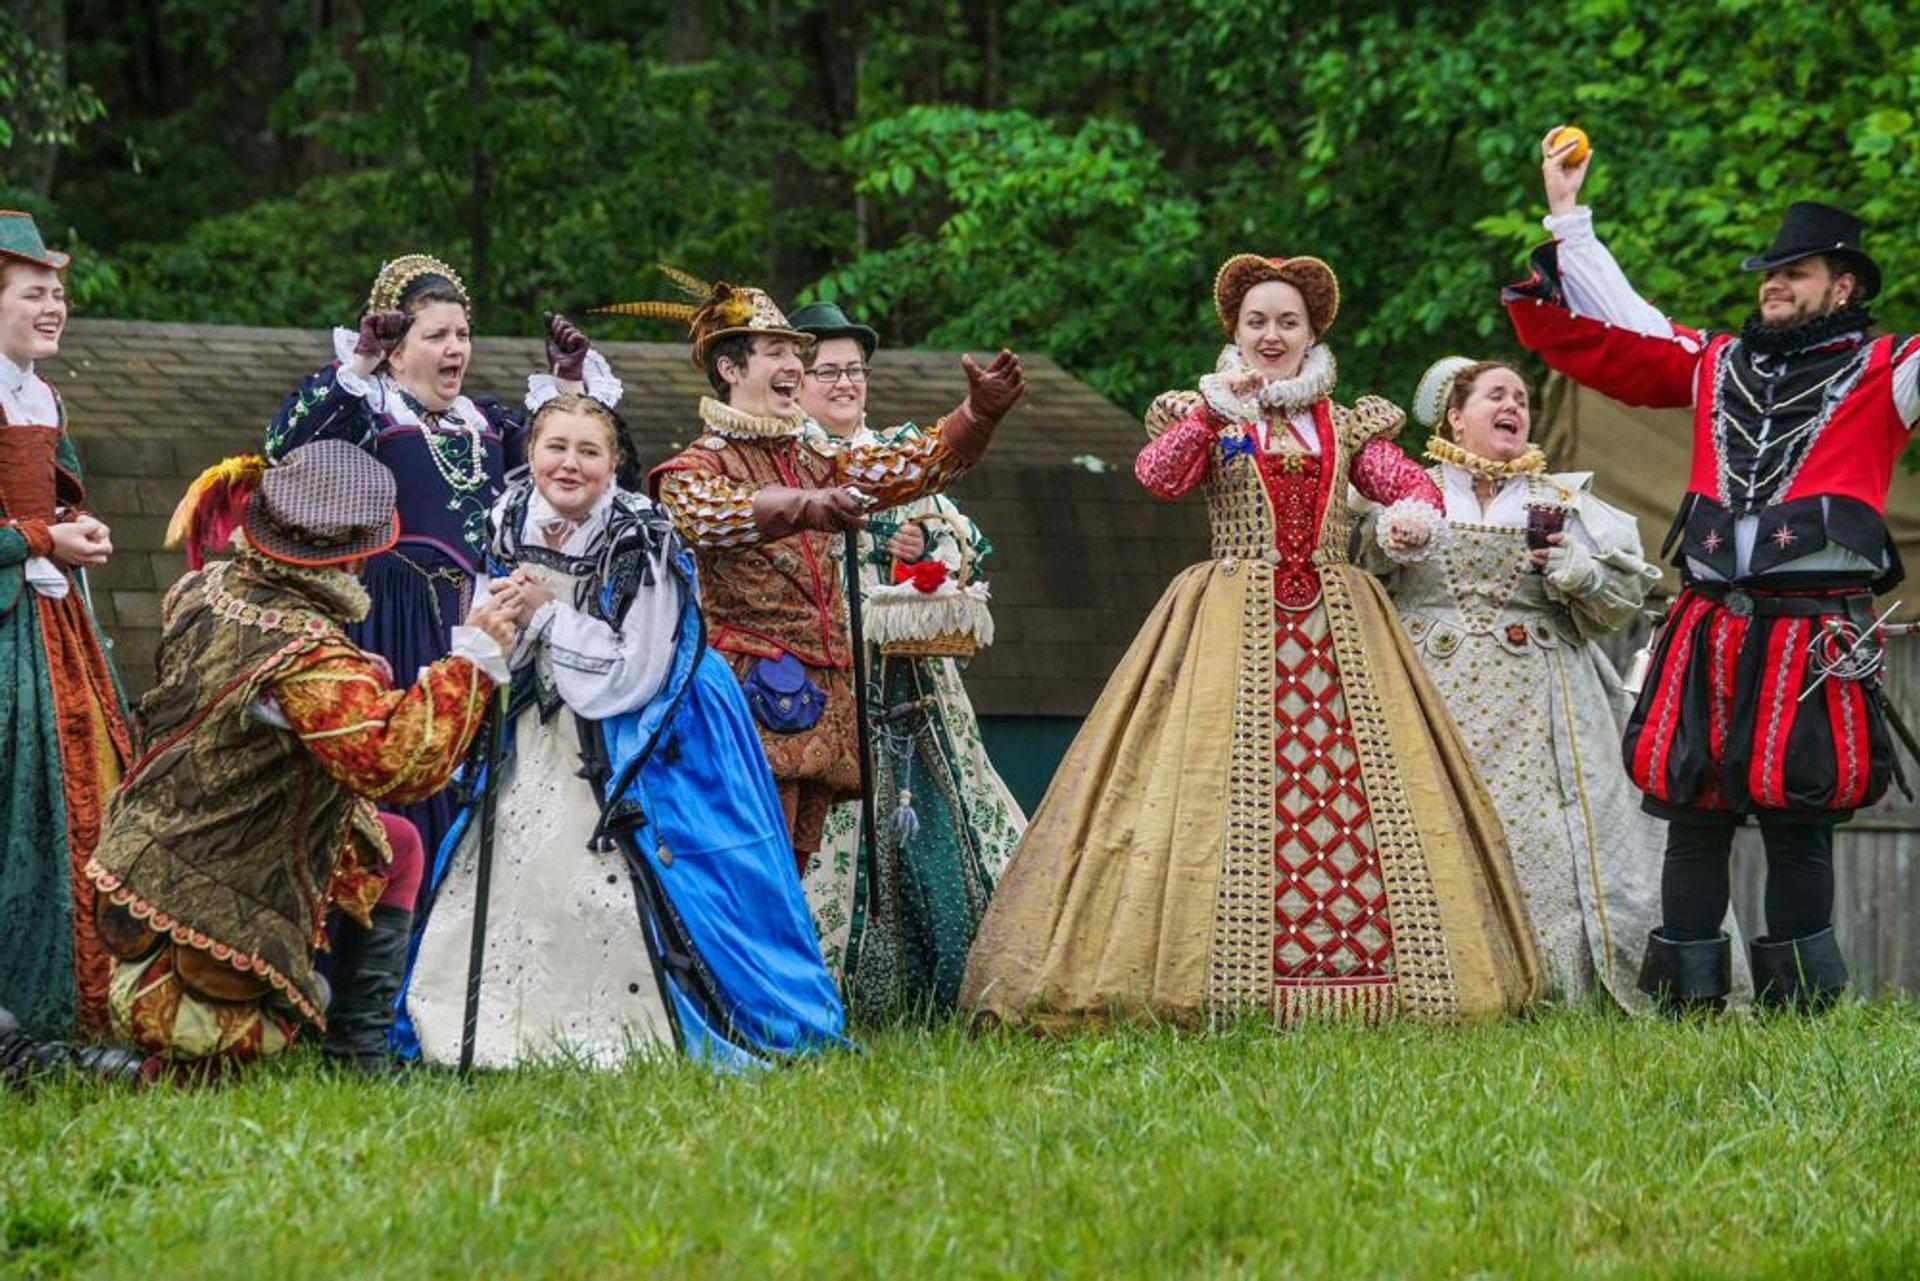 Virginia Renaissance Faire in Virginia 2020 - Best Time